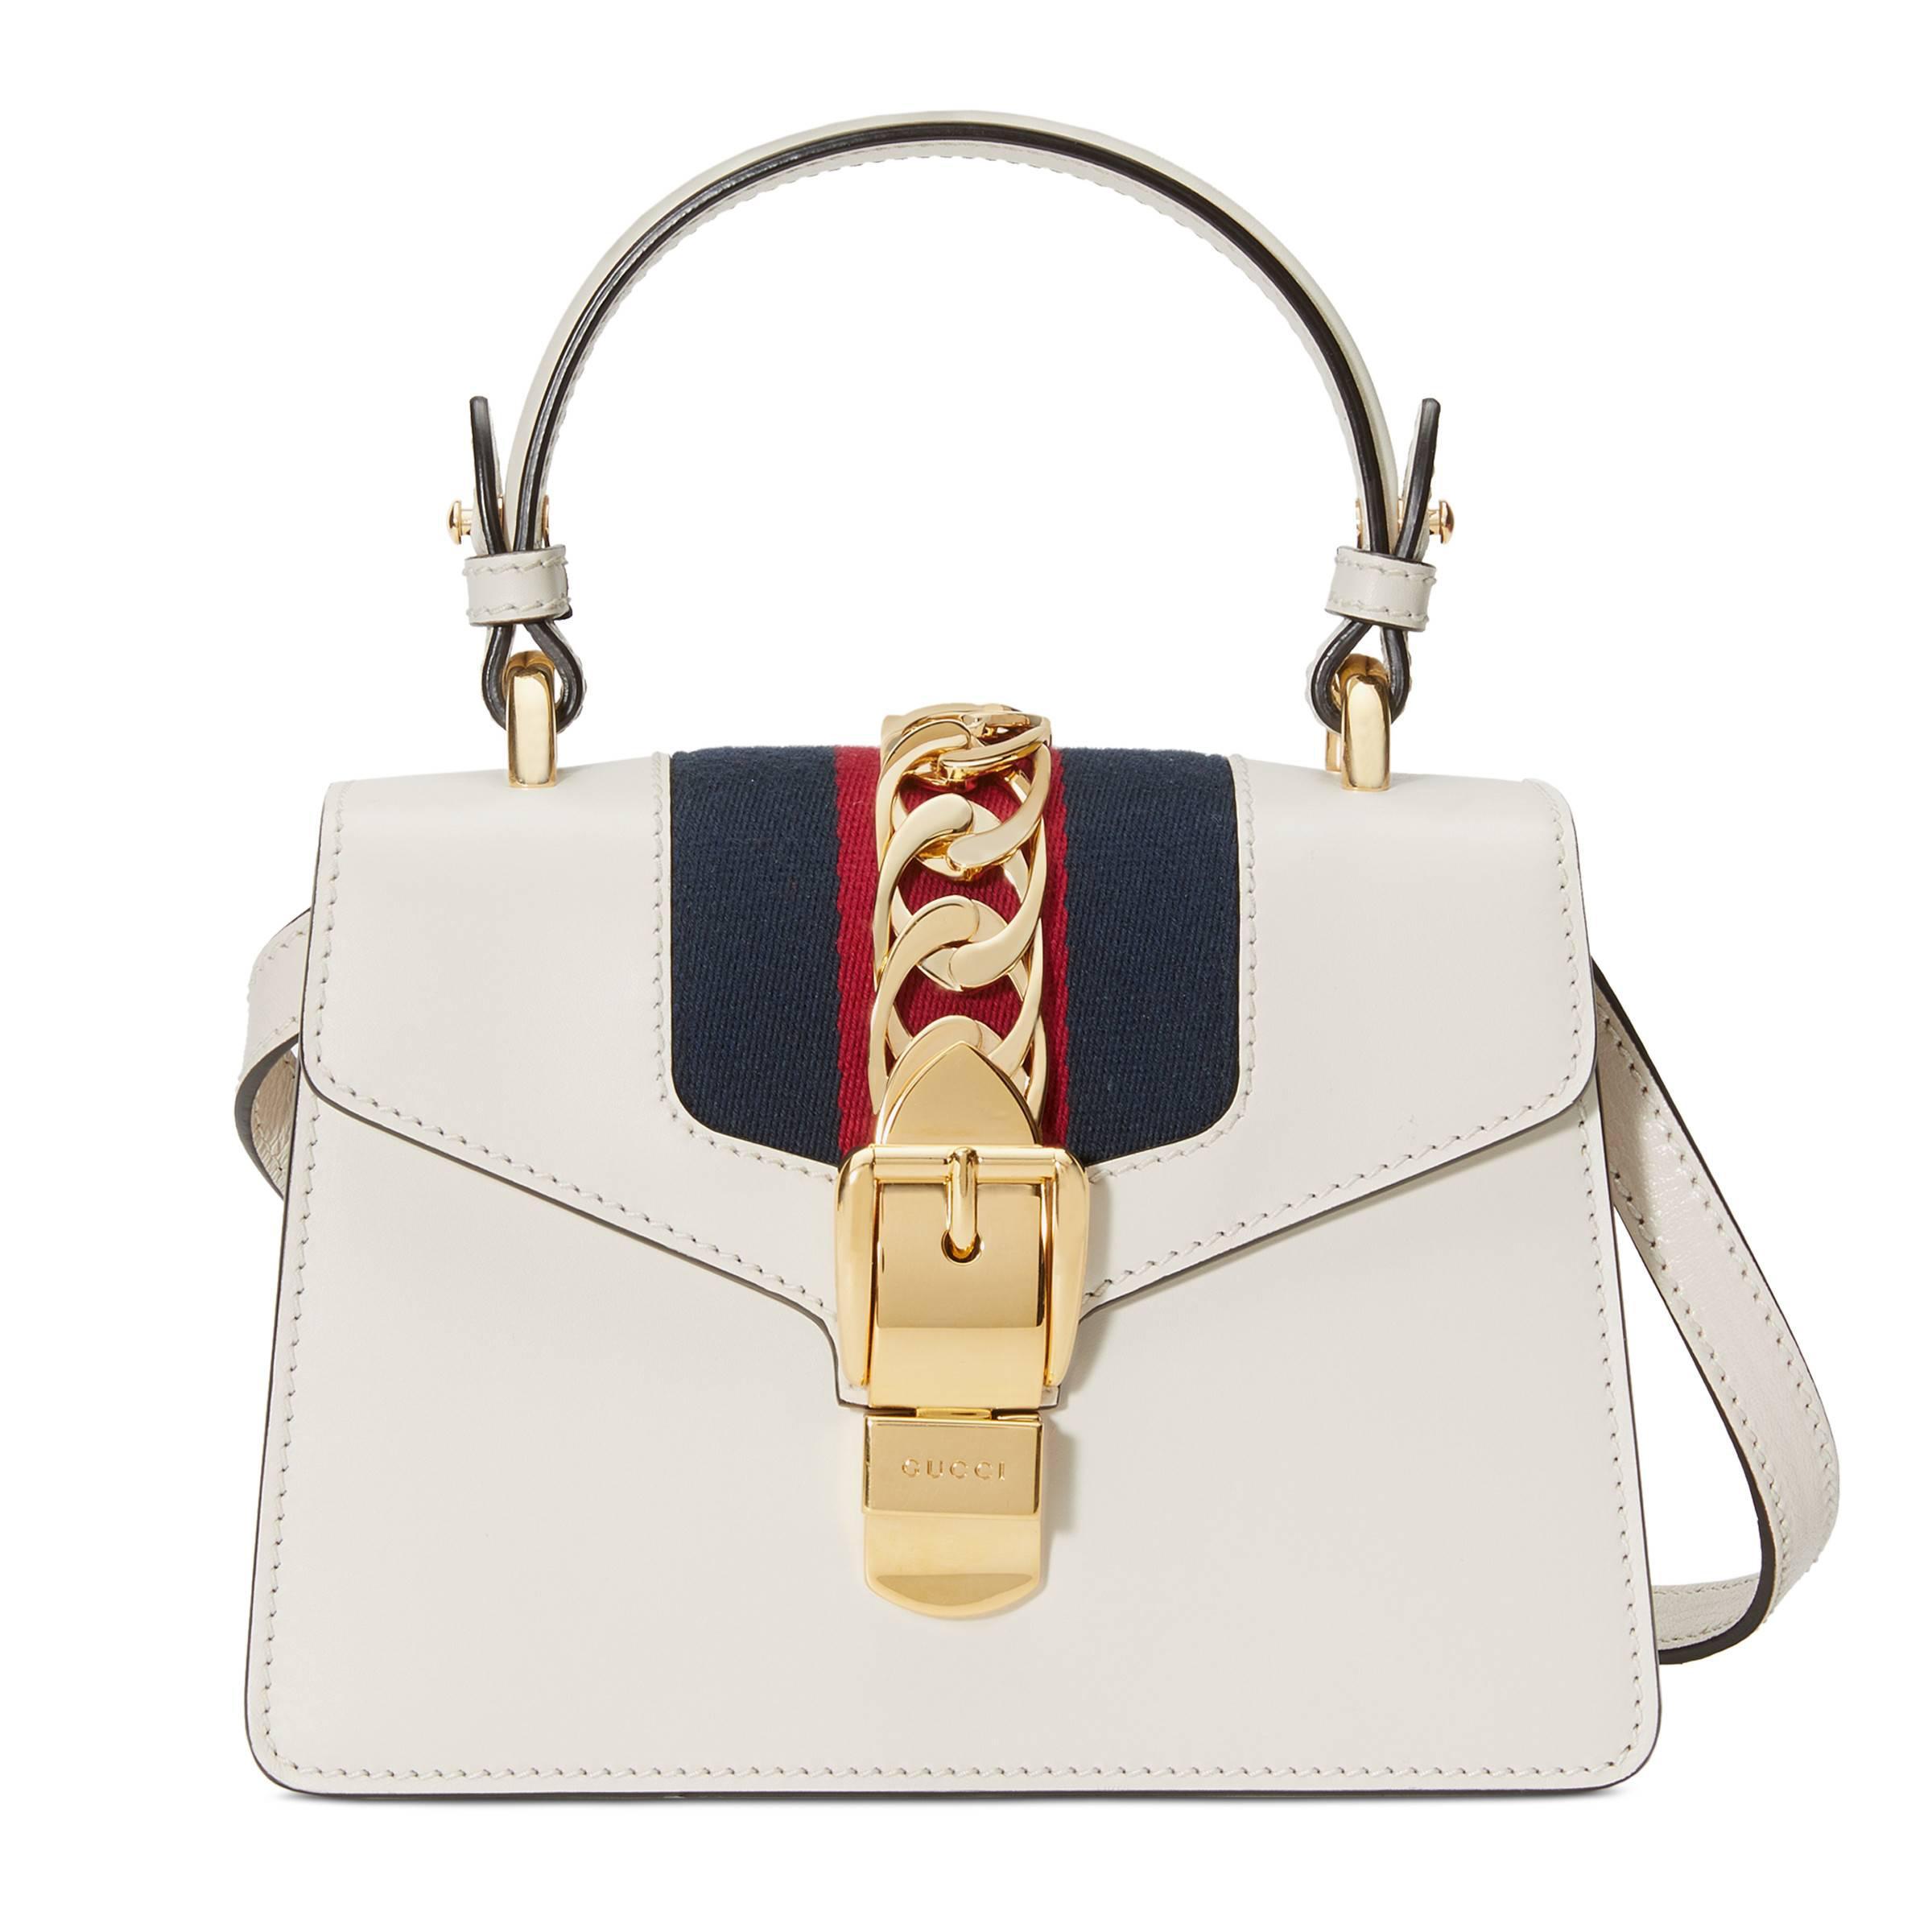 45271f6cba9 Gucci - White Mini sac Sylvie en cuir - Lyst. Afficher en plein écran